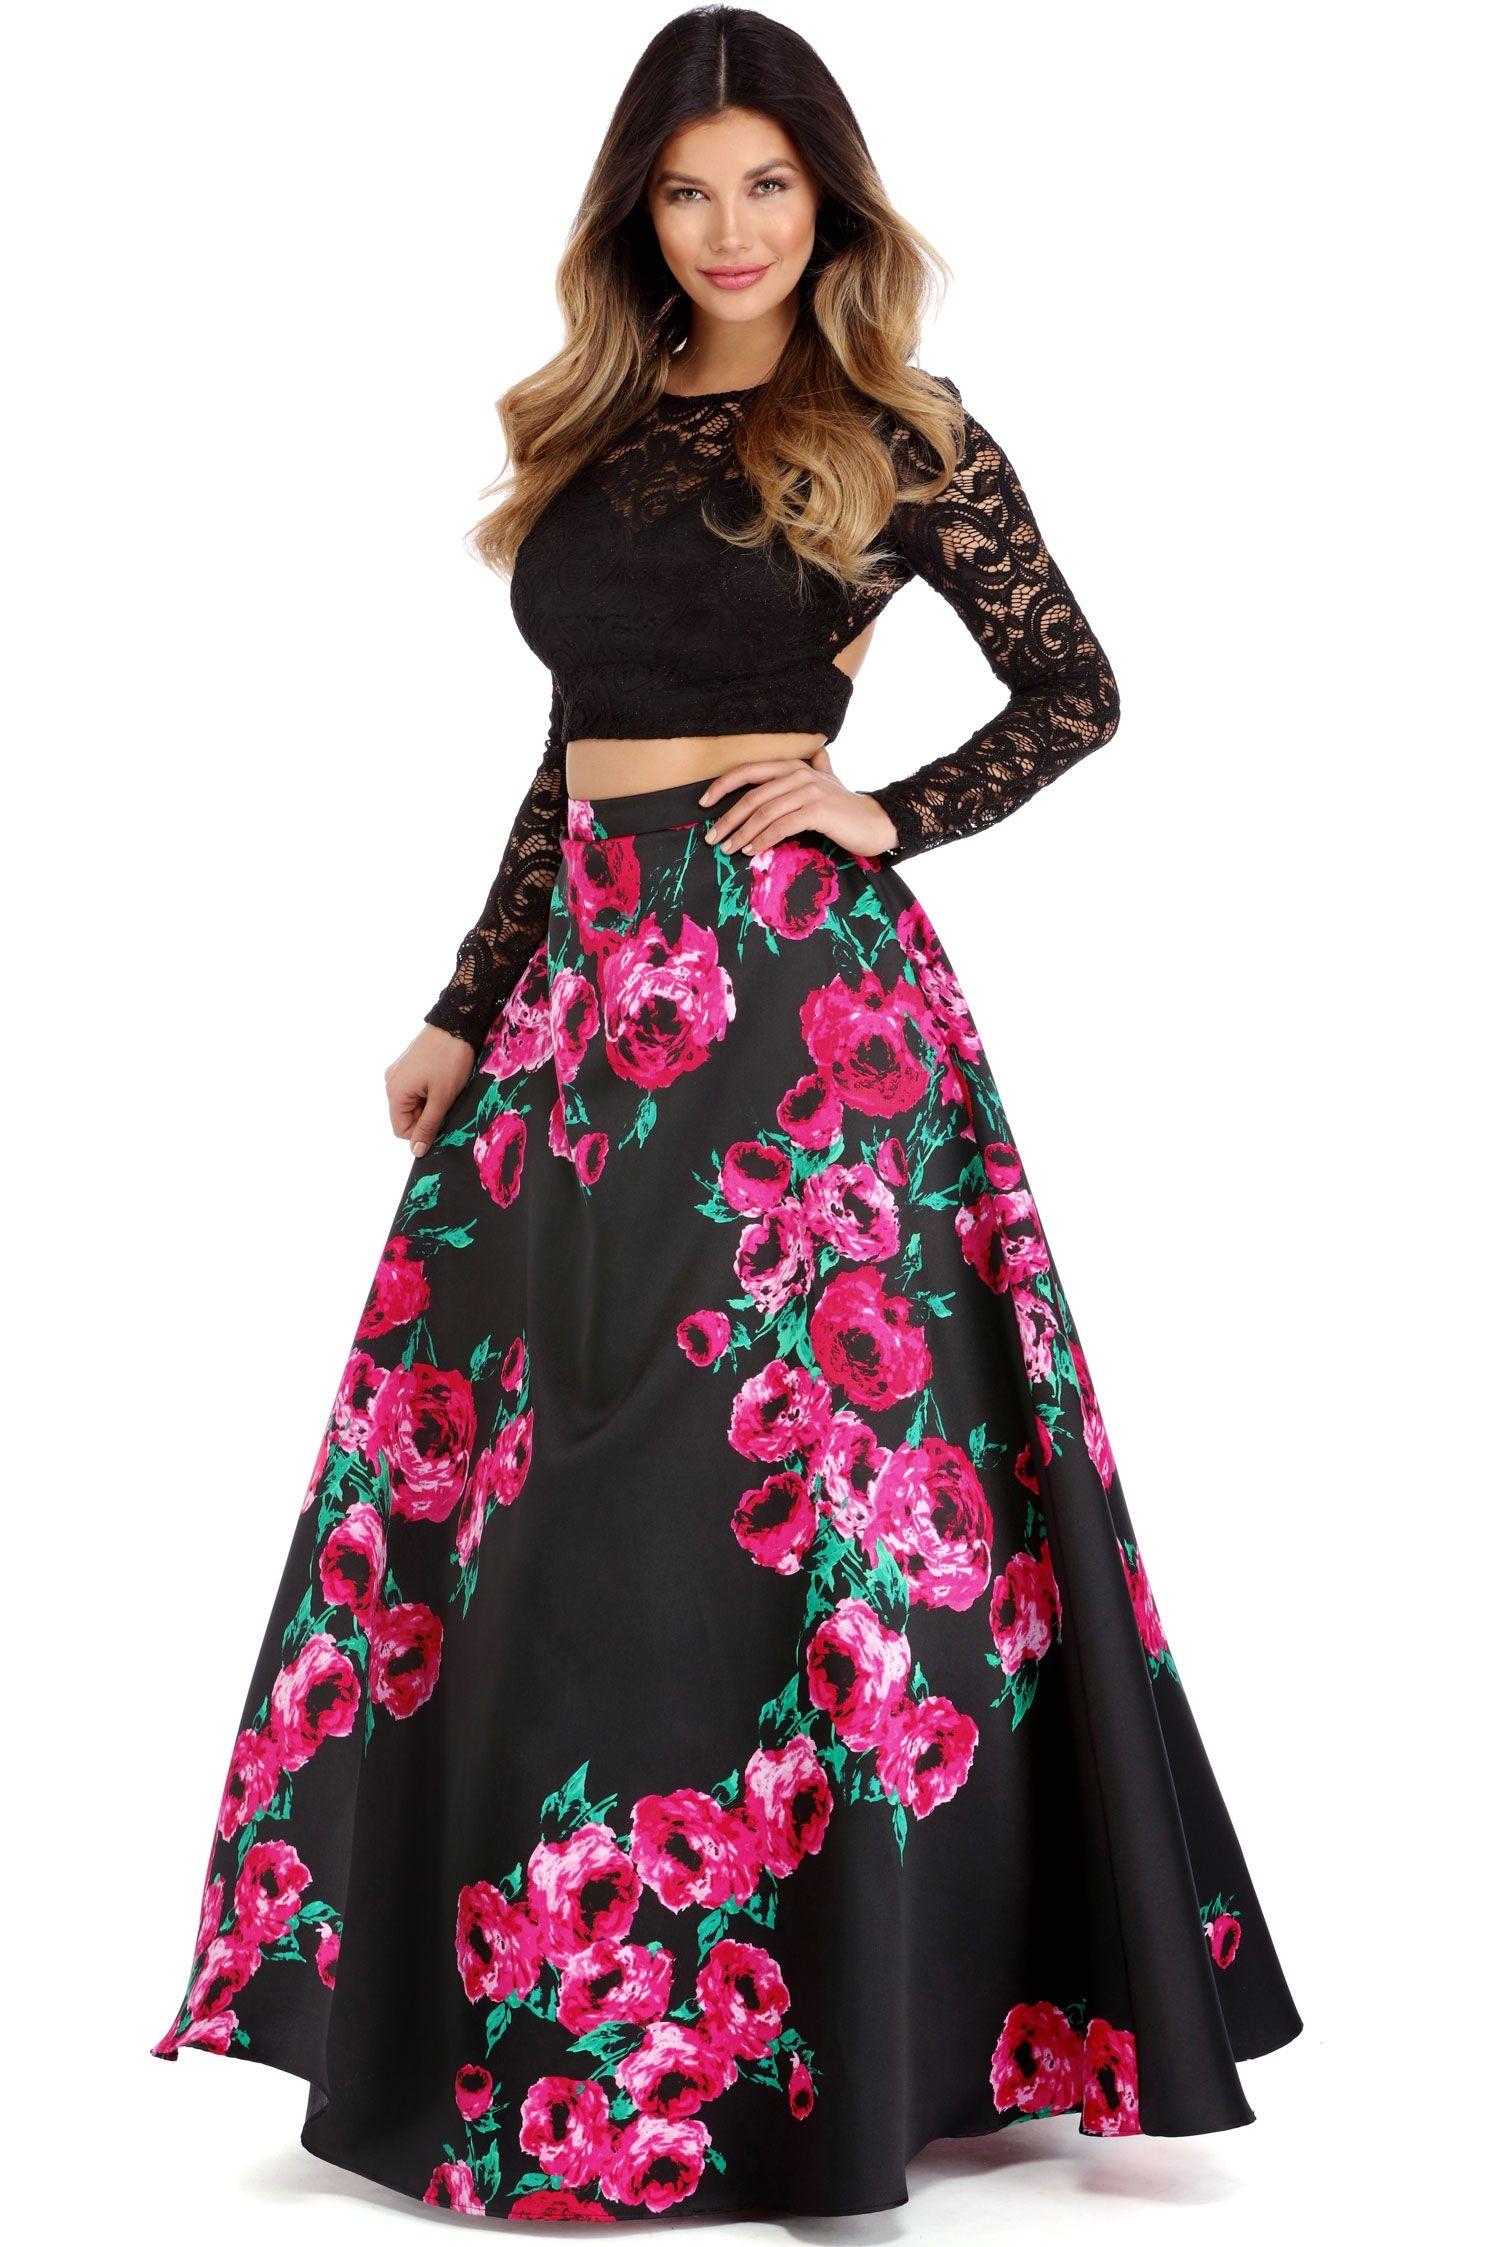 fd48b52f5497 Samara Black Two Piece Dress | Windsor | Prom dresses, Two piece ...